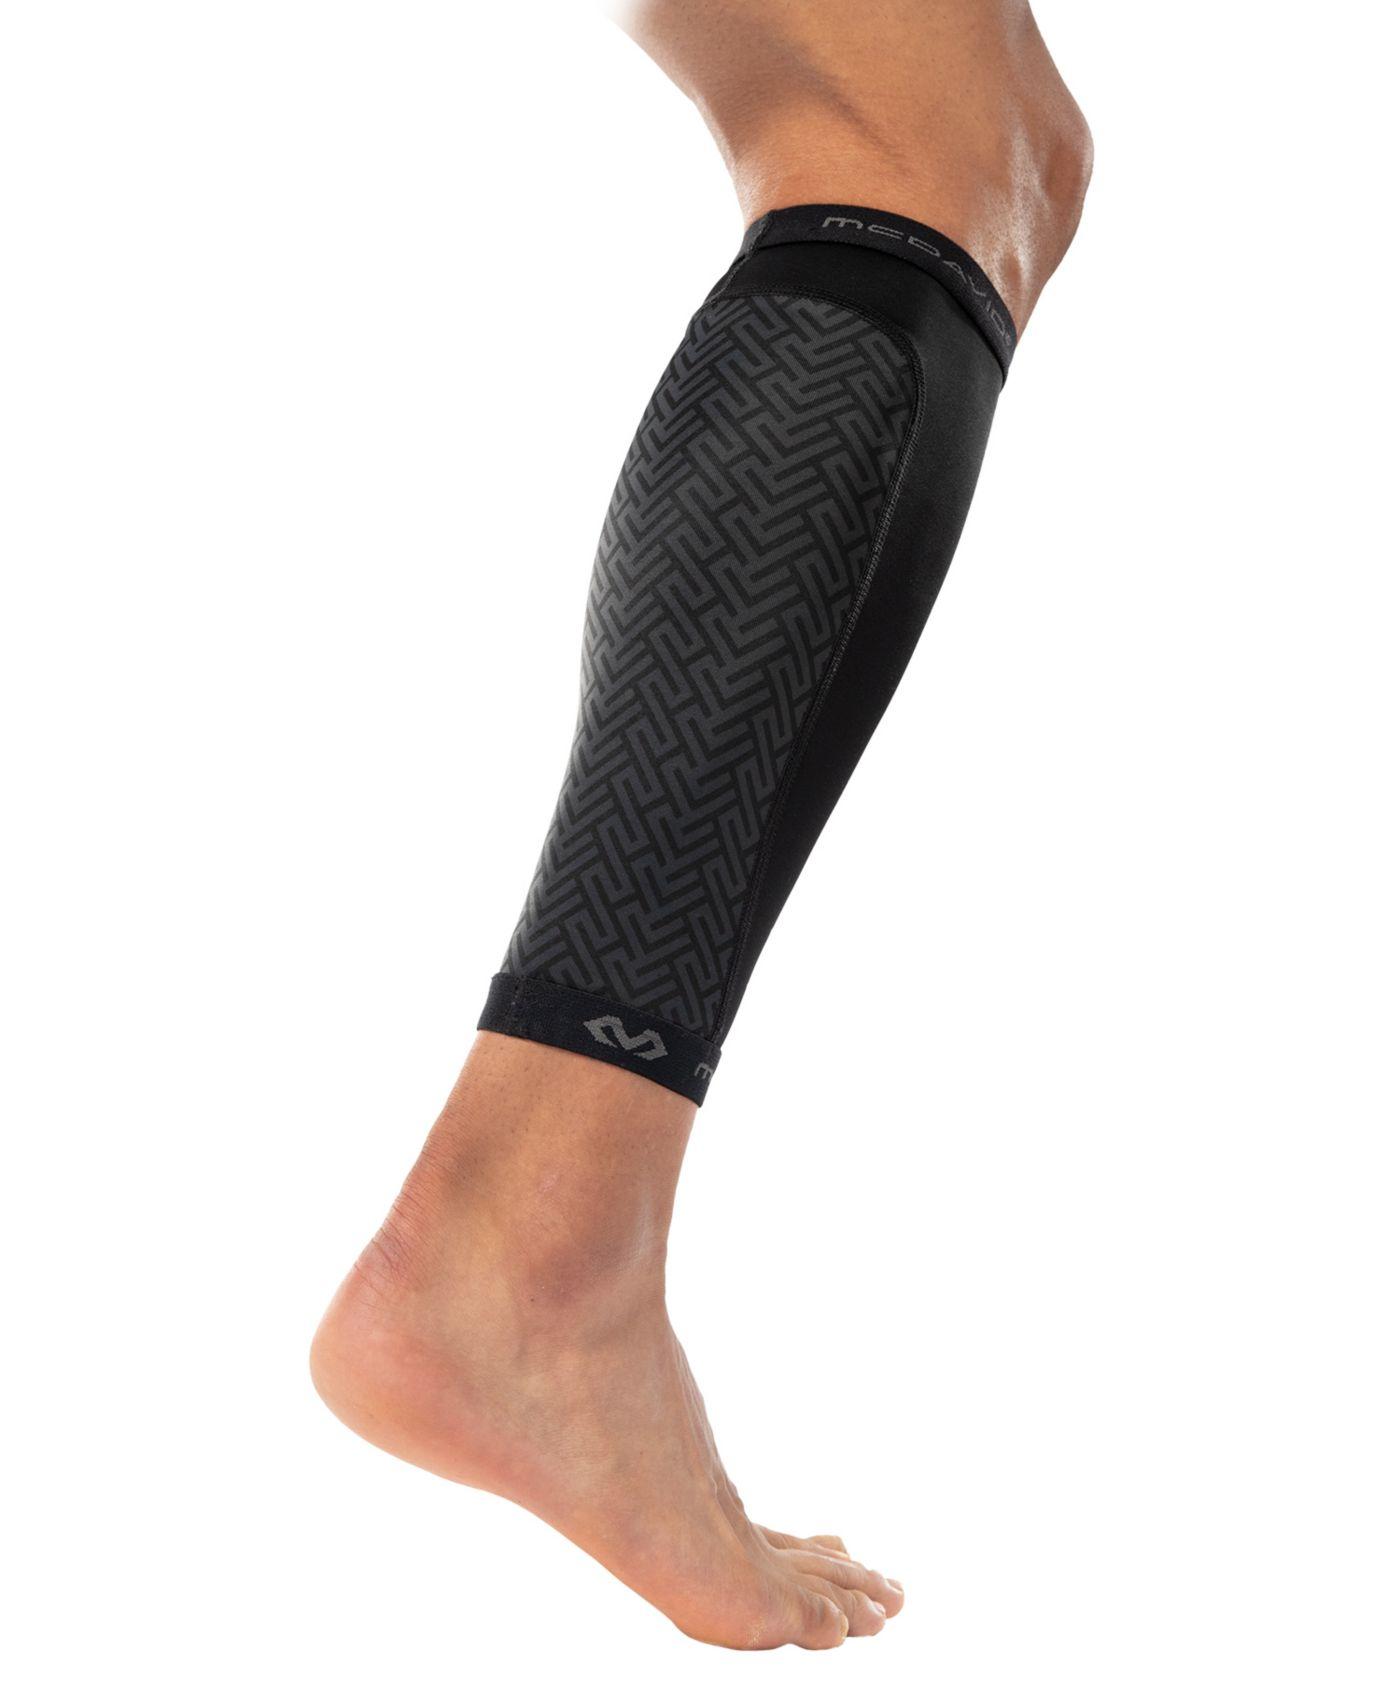 McDavid Fitness Calf Sleeves